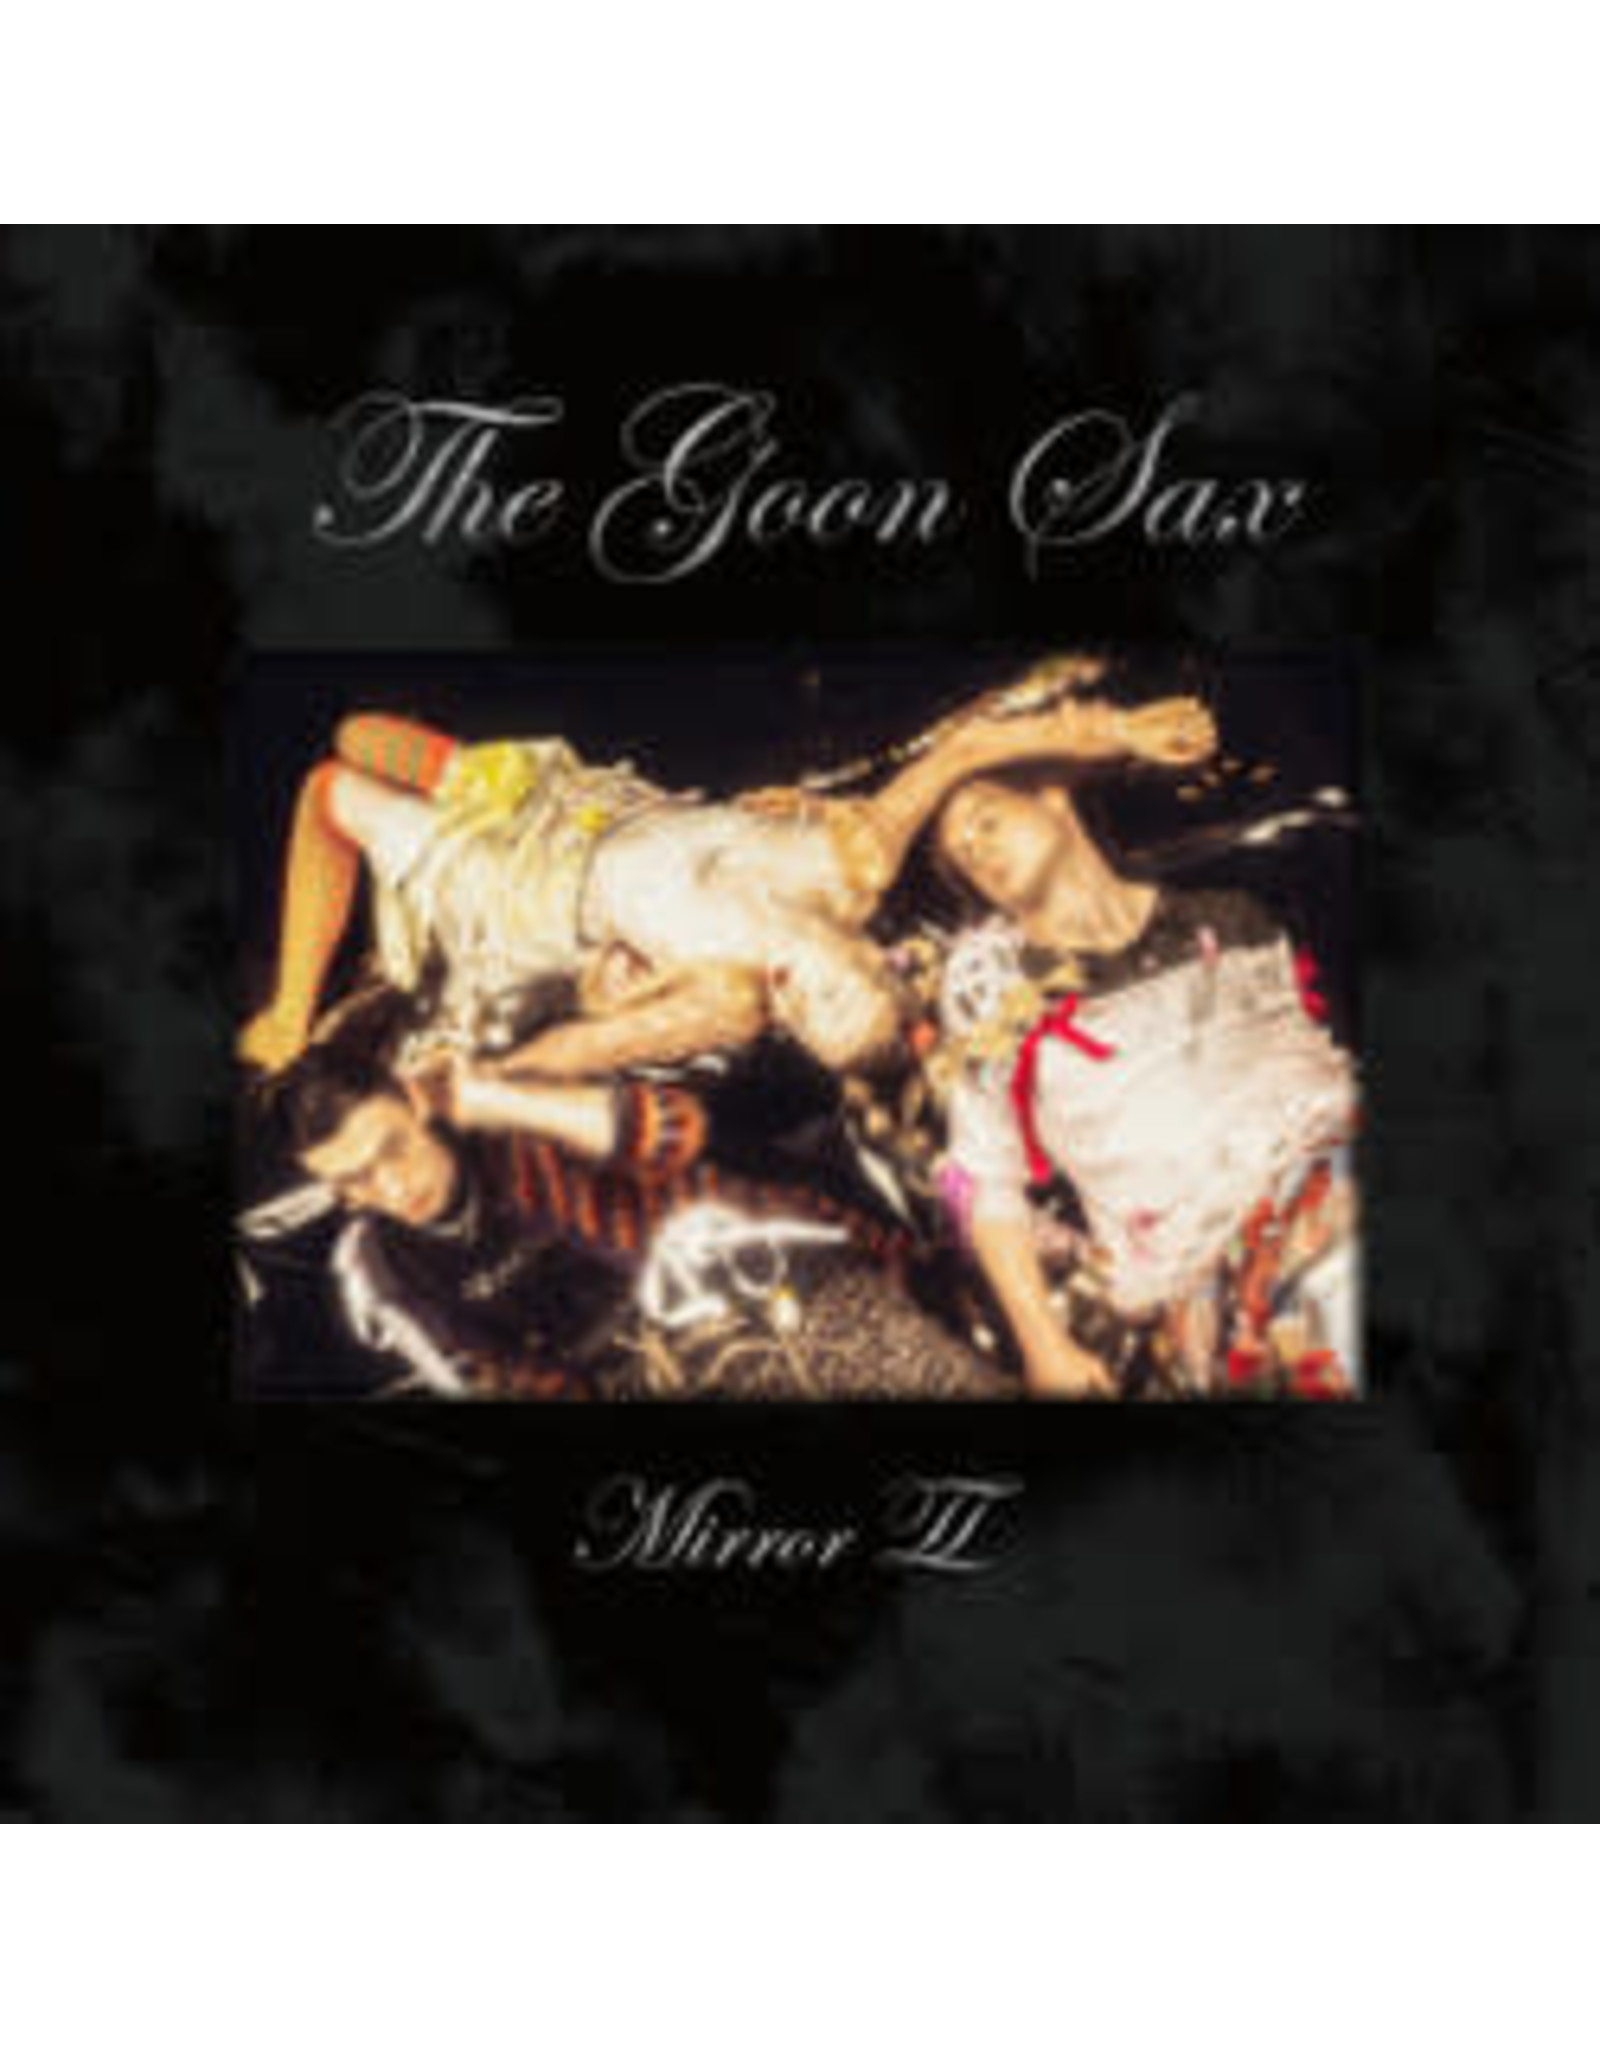 New Vinyl The Goon Sax - Mirror II (Colored) LP